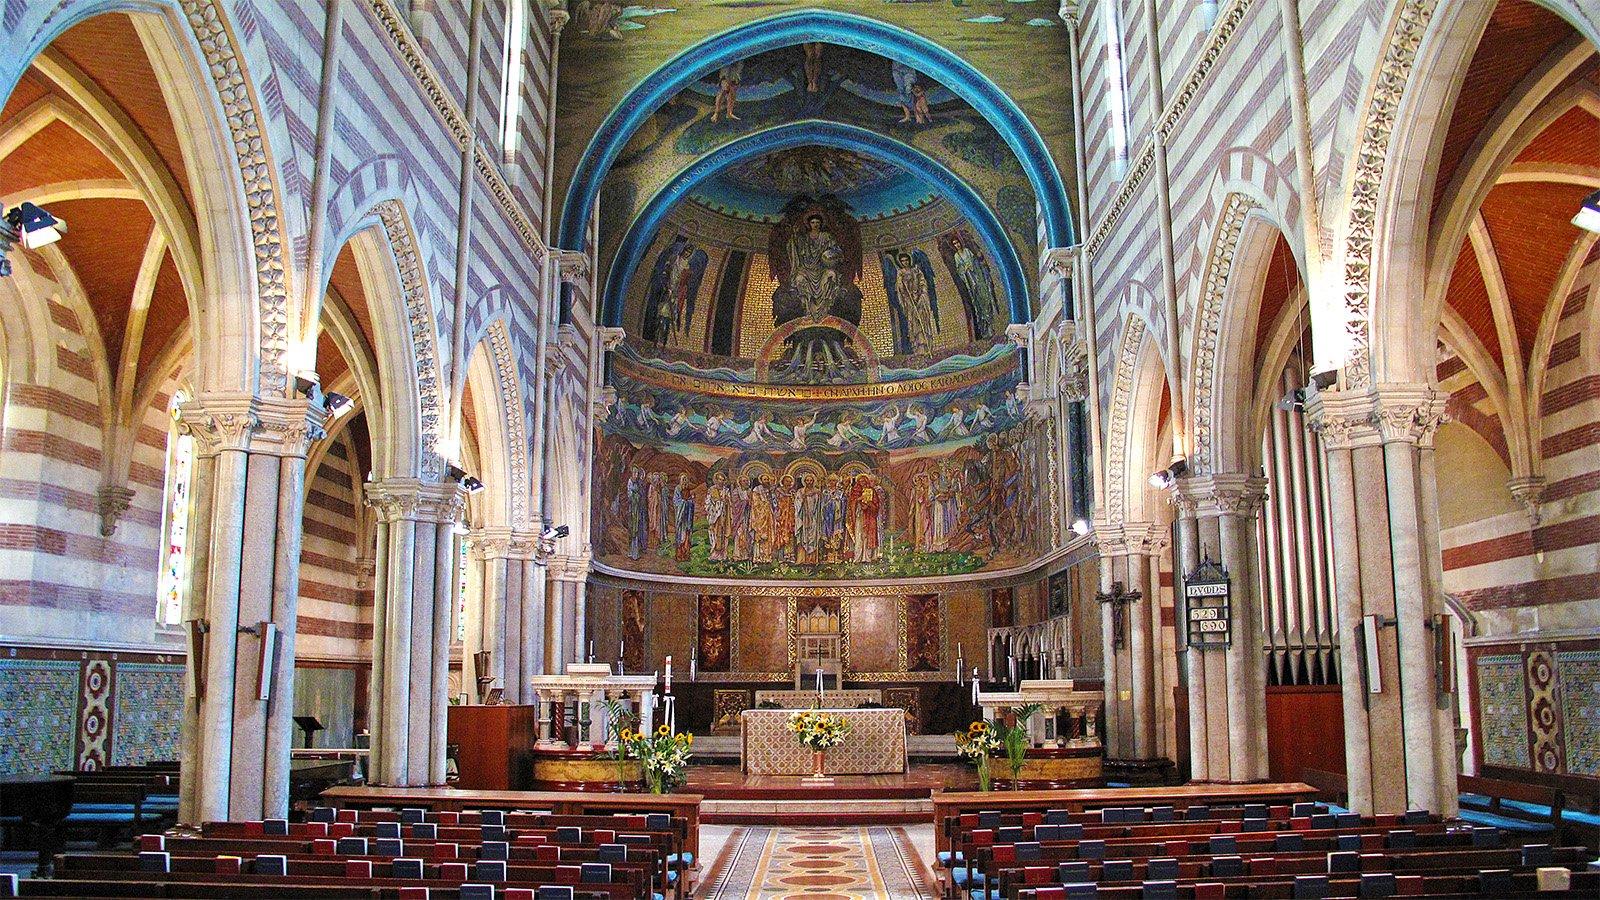 Saint Paul's Within the Walls Church